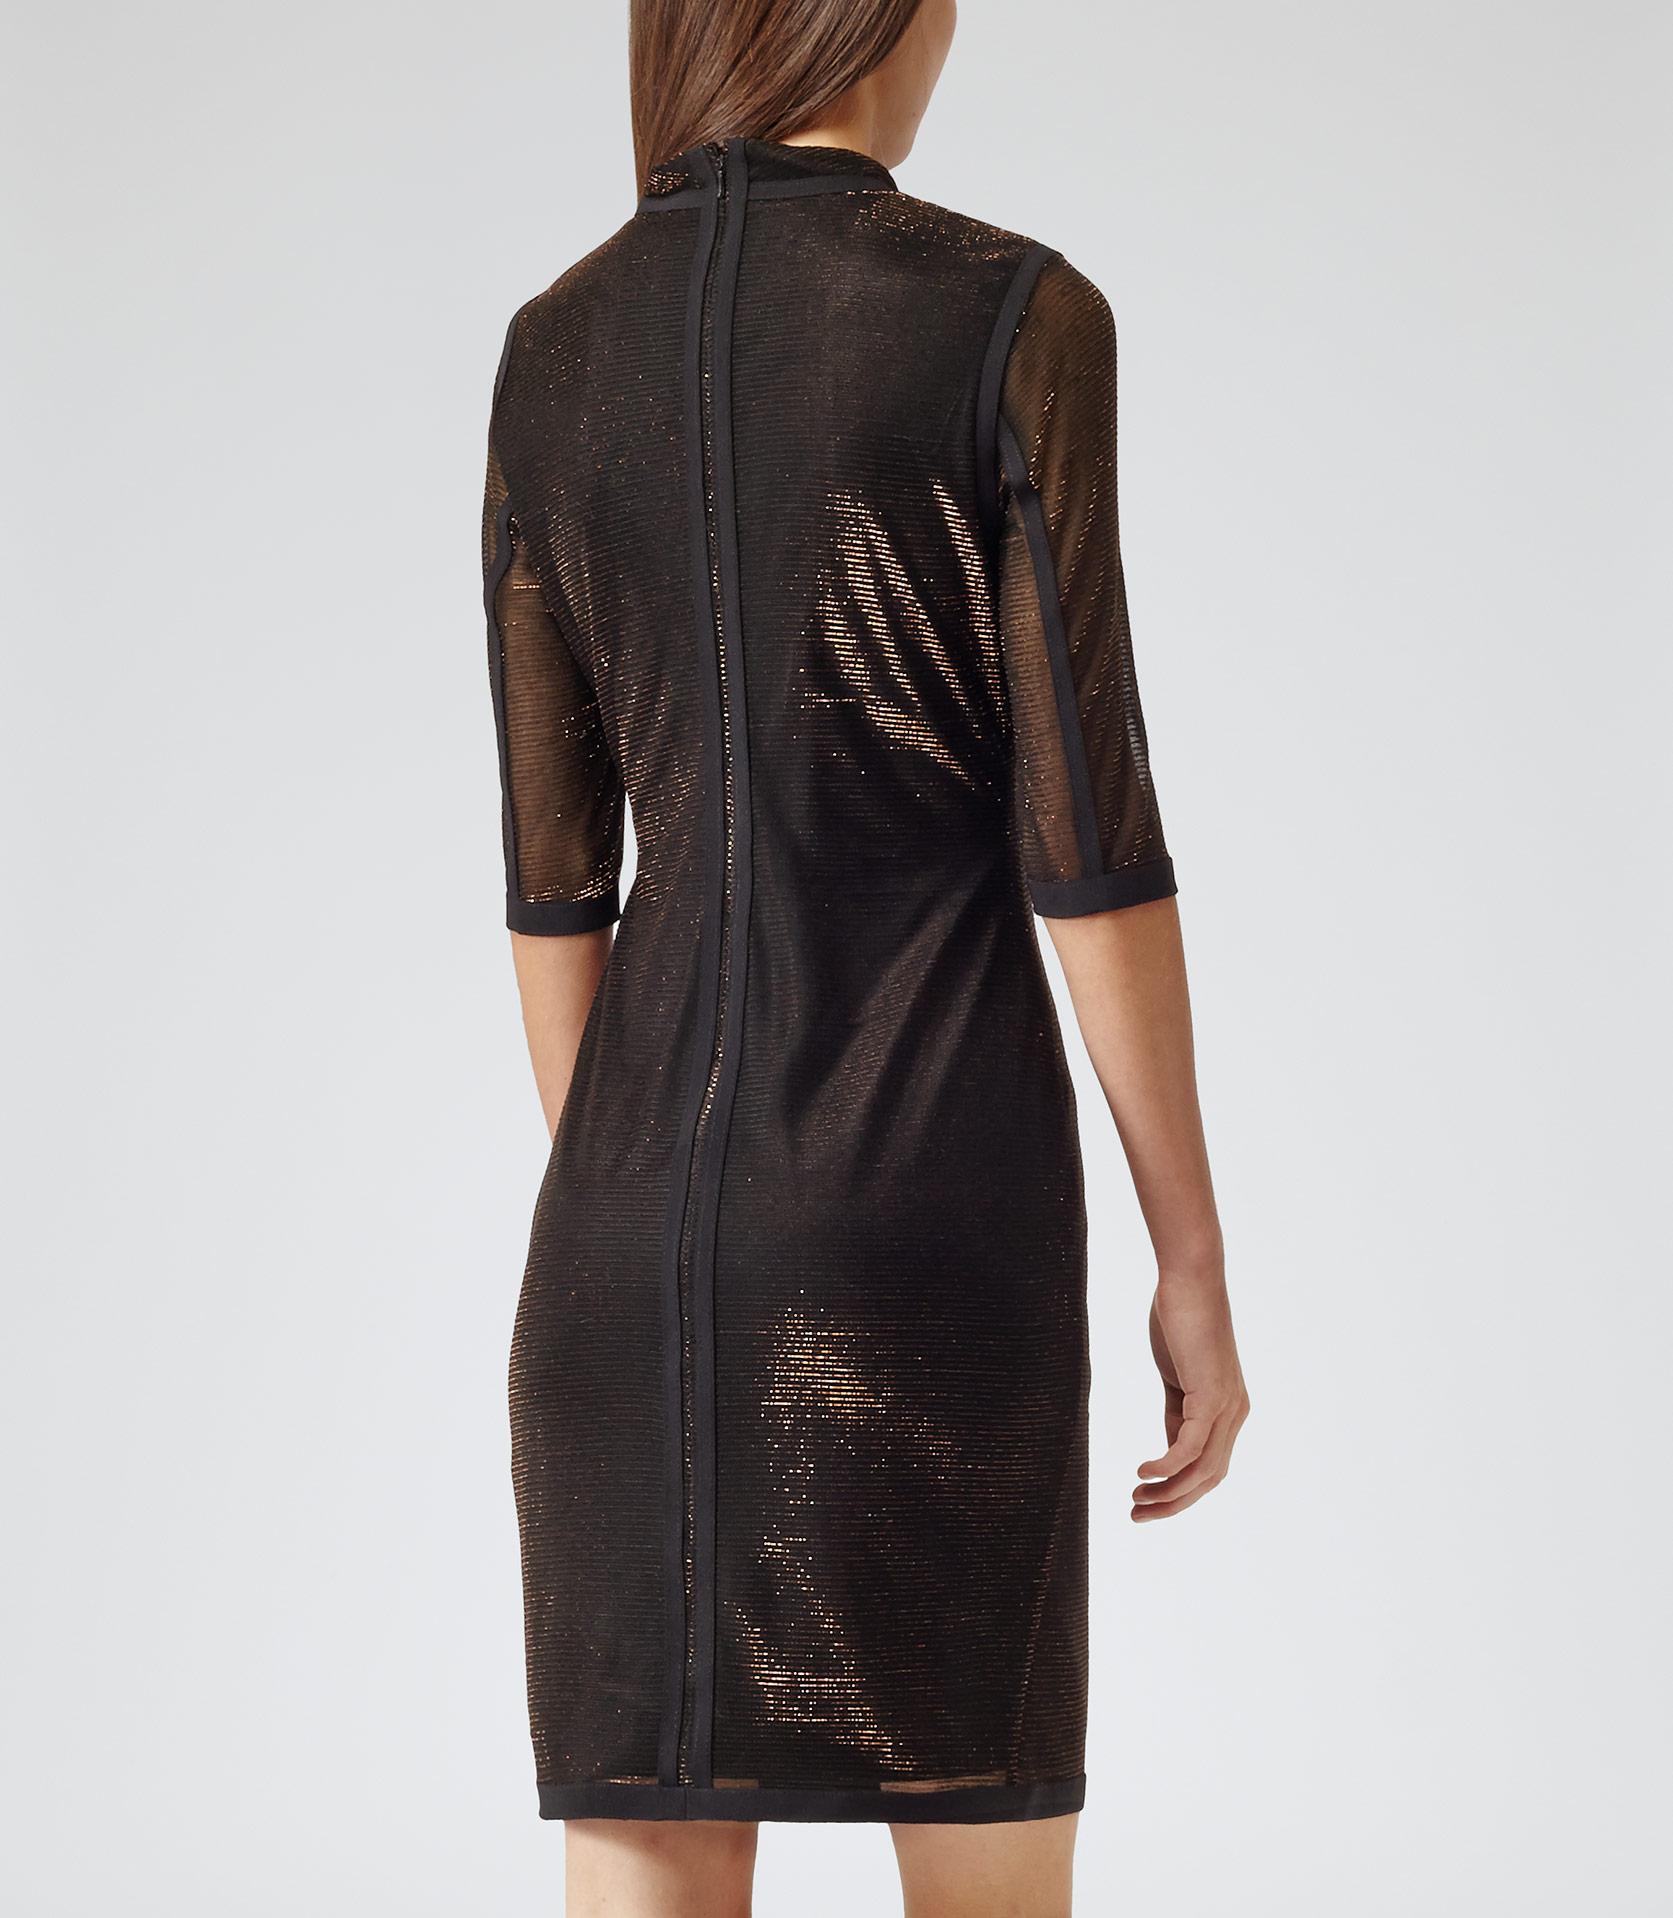 Reiss Kasia High Neck Bodycon Dress In Bronze Black Lyst